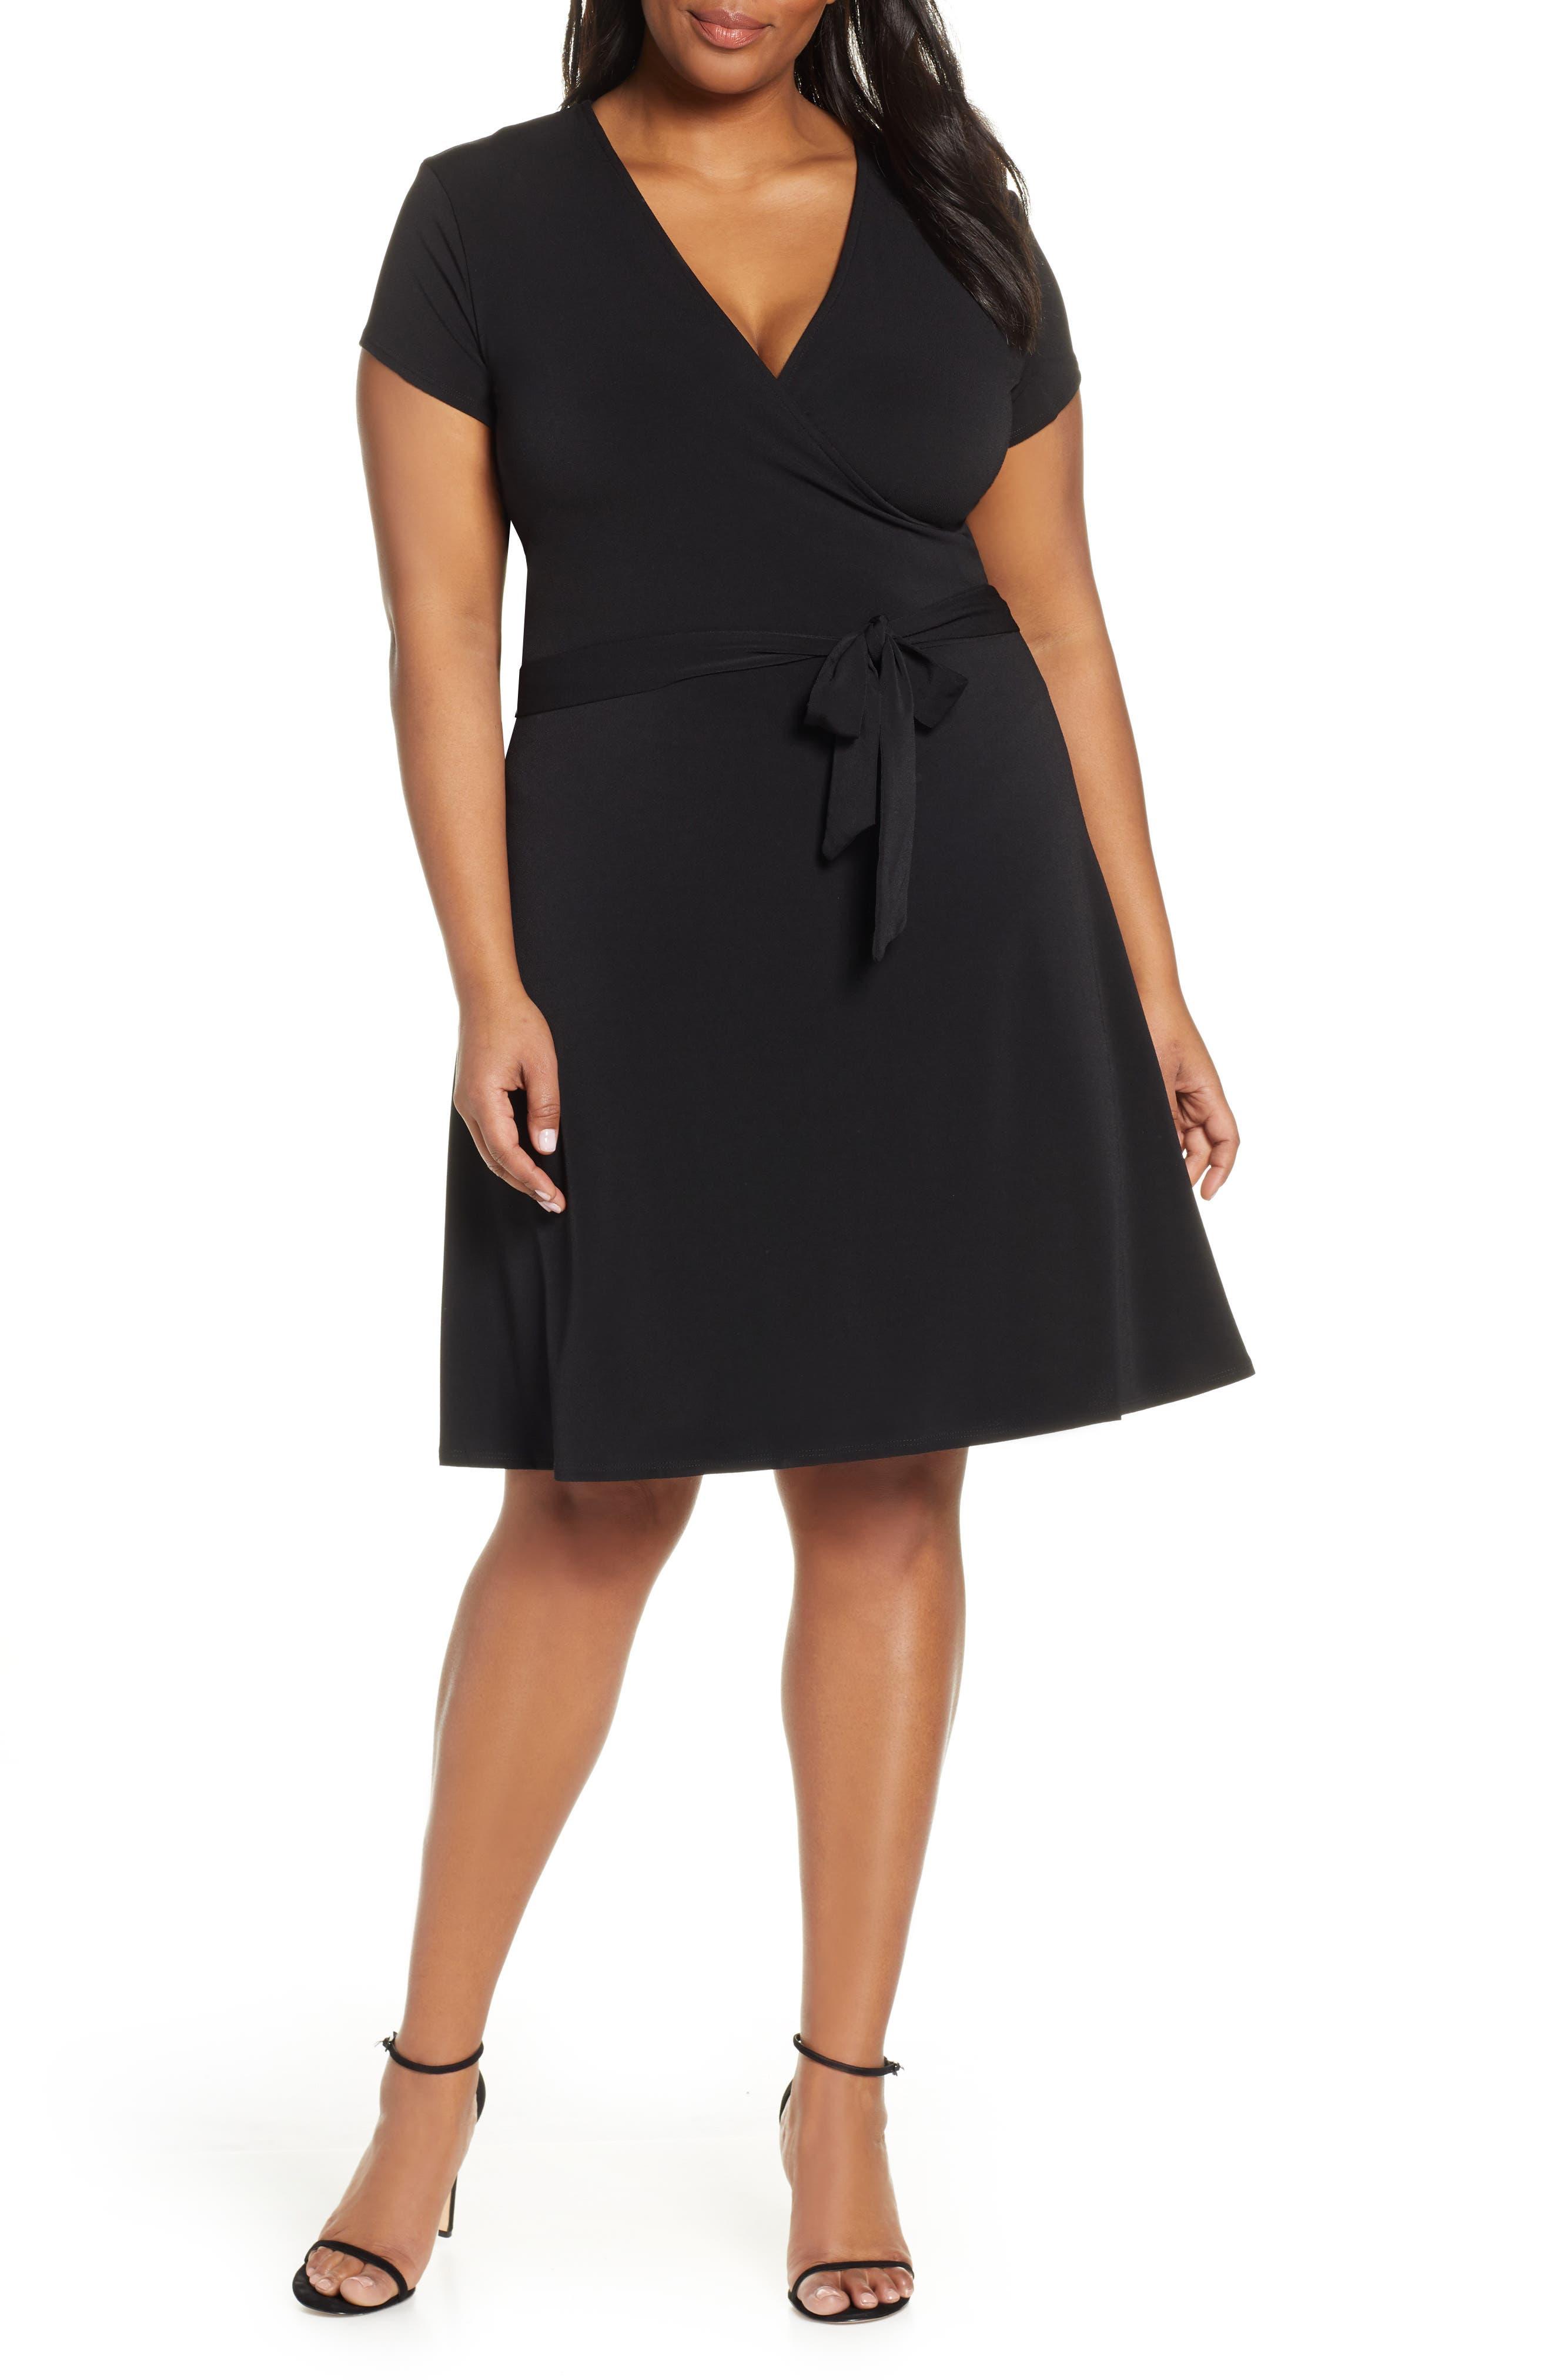 Plus Size Leota Perfect Faux Wrap Dress, Black